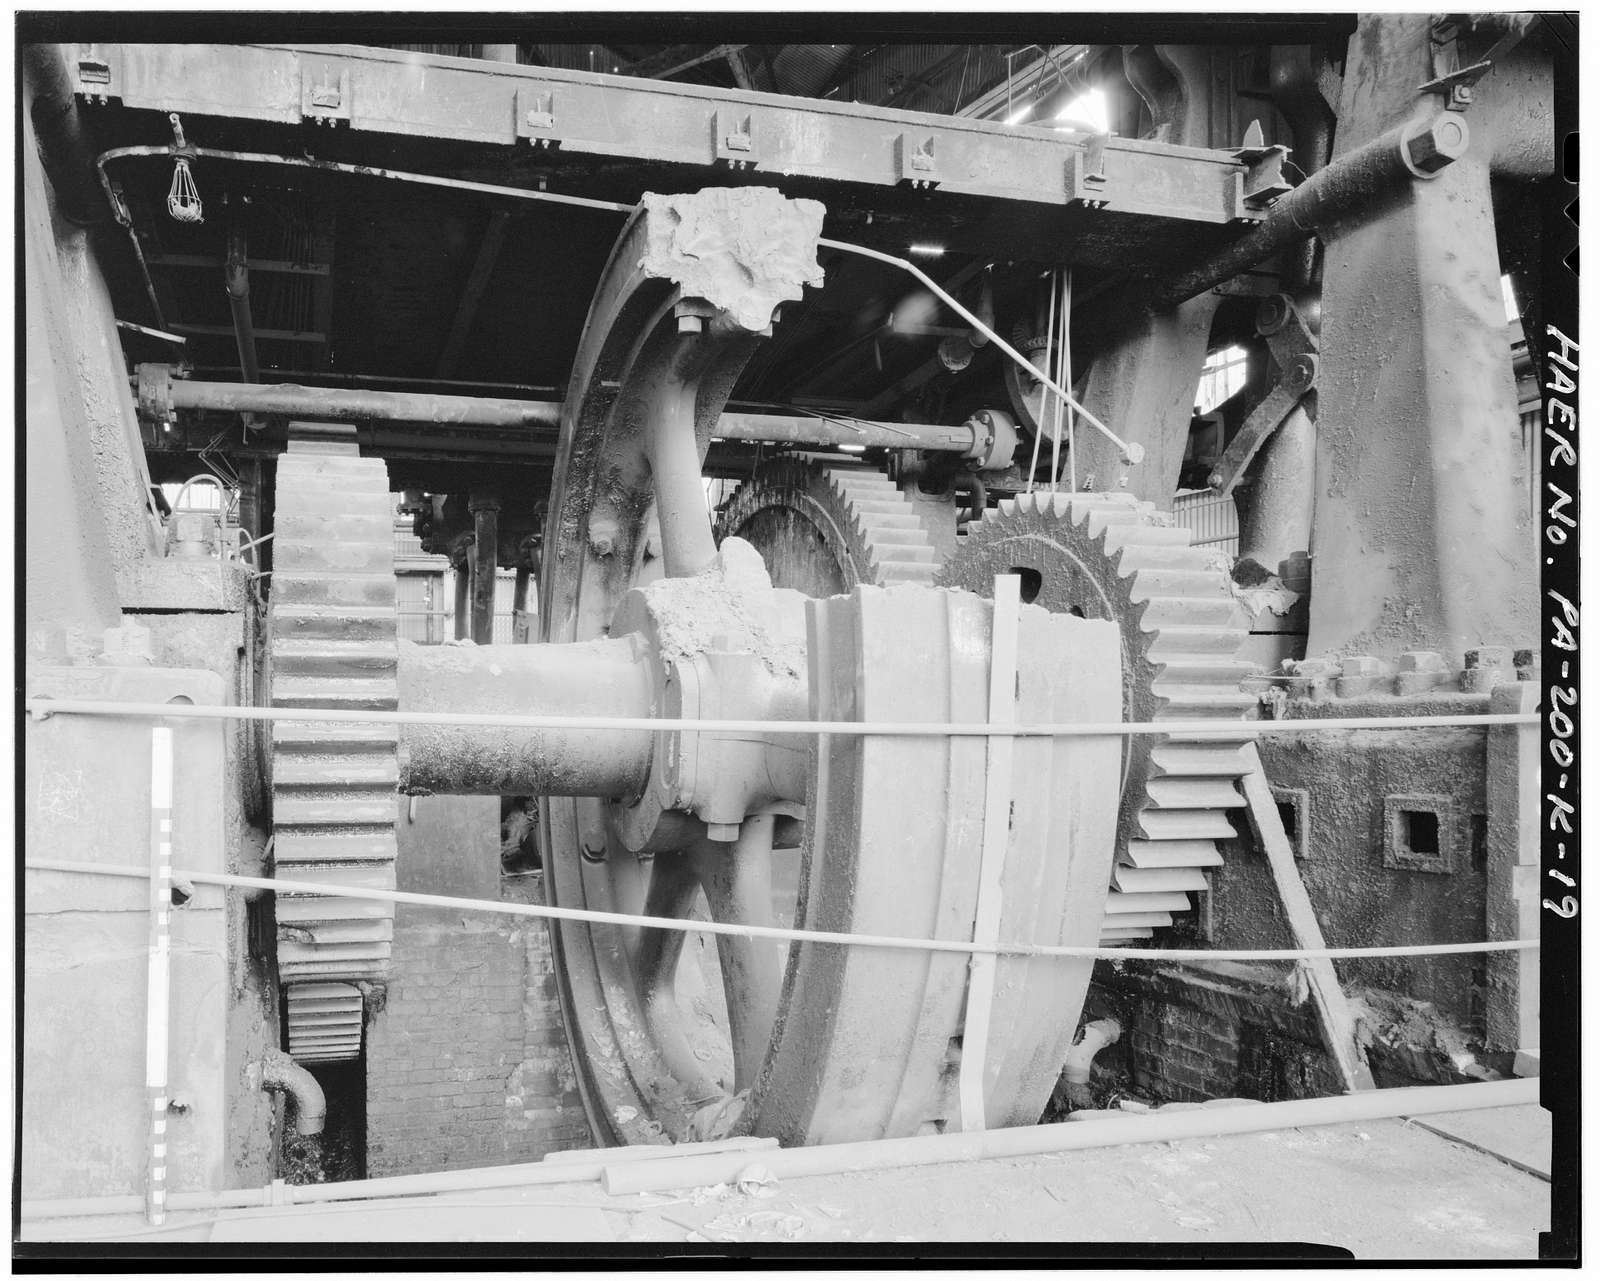 U.S. Steel Homestead Works, Press Shop No. 1, Along Monongahela River, Homestead, Allegheny County, PA